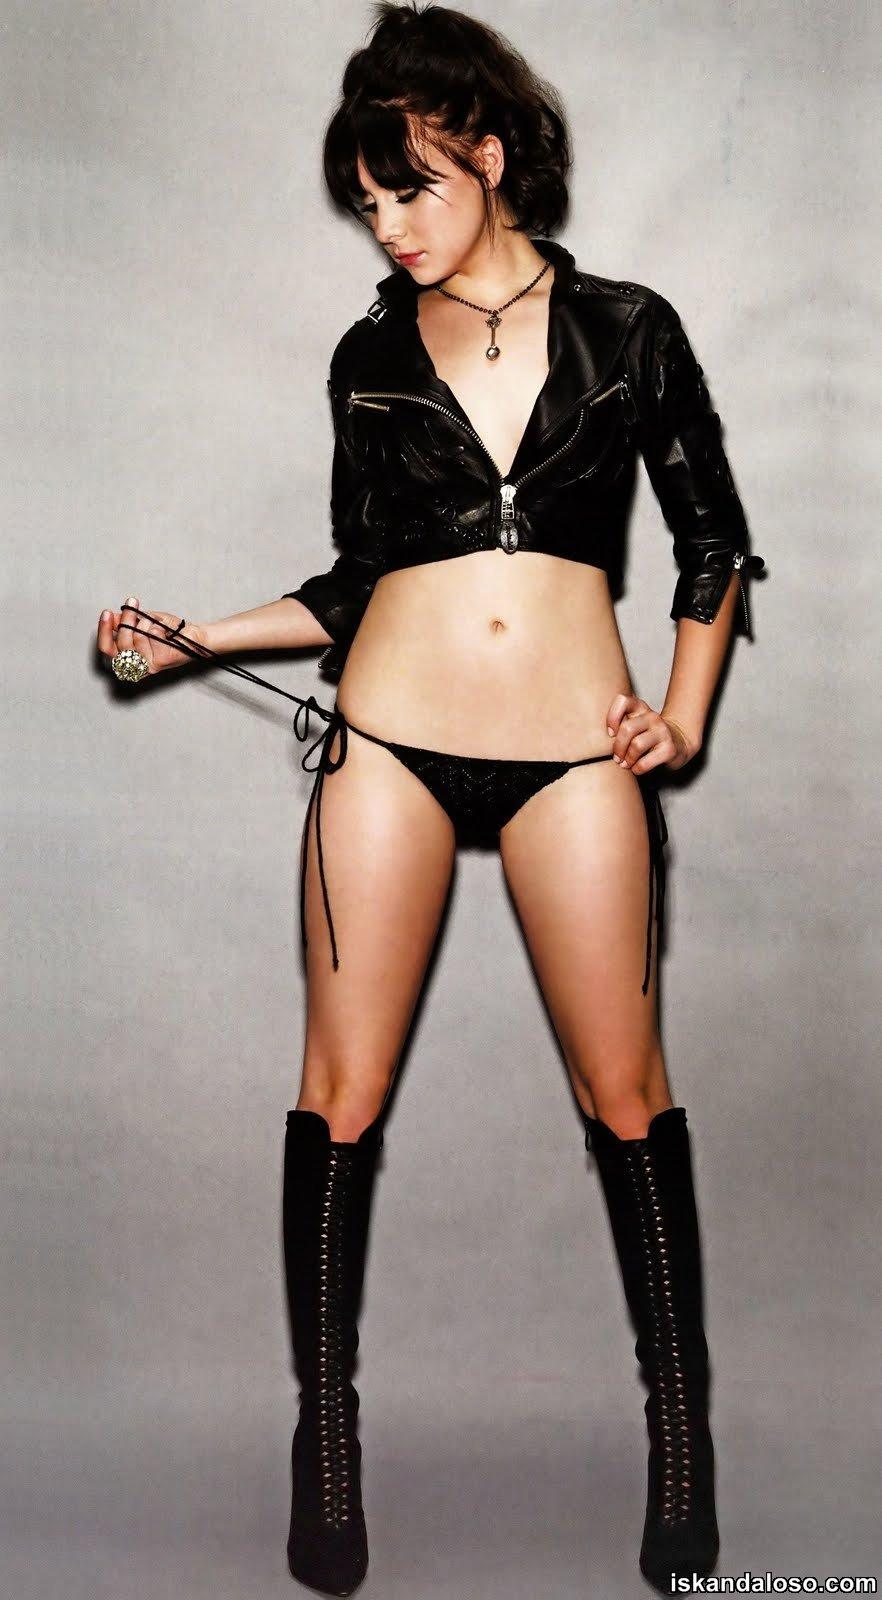 The Iskandaloso Group: Alessandra Torresanis Topless